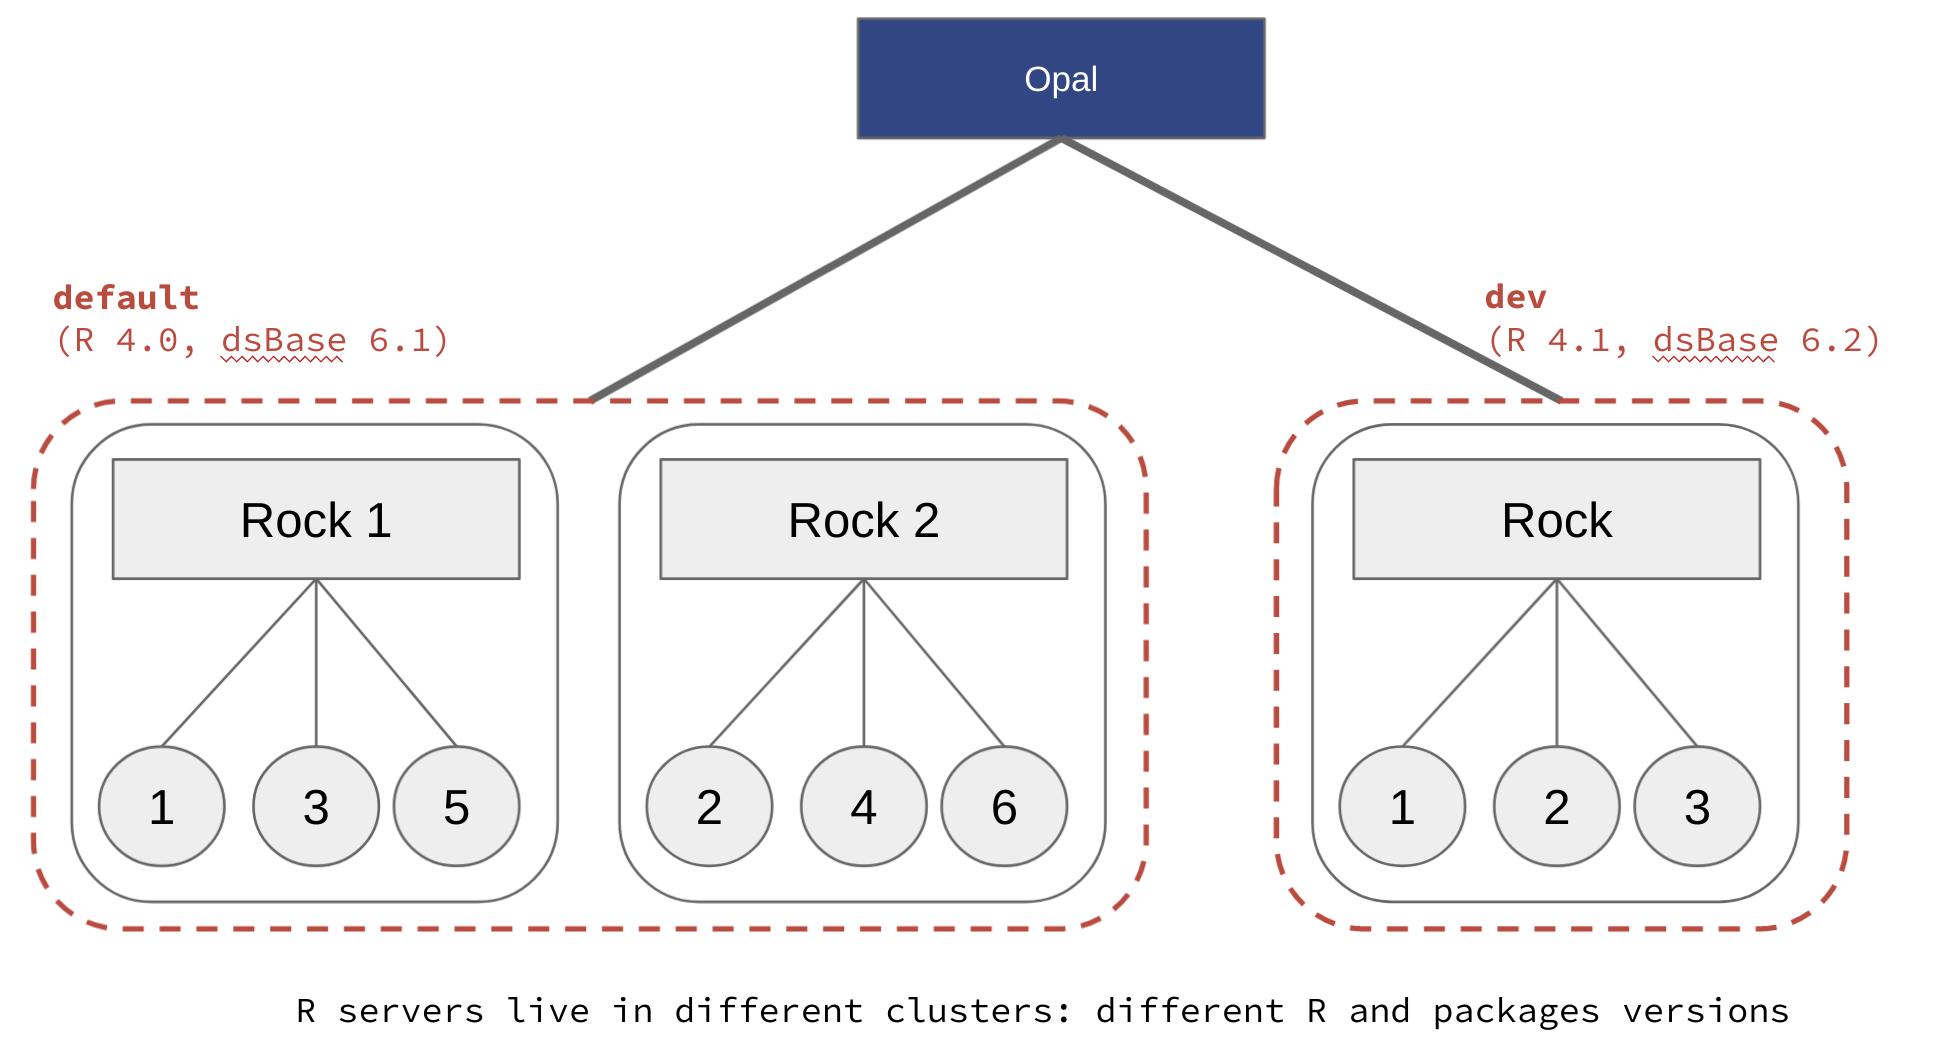 R servers clusters